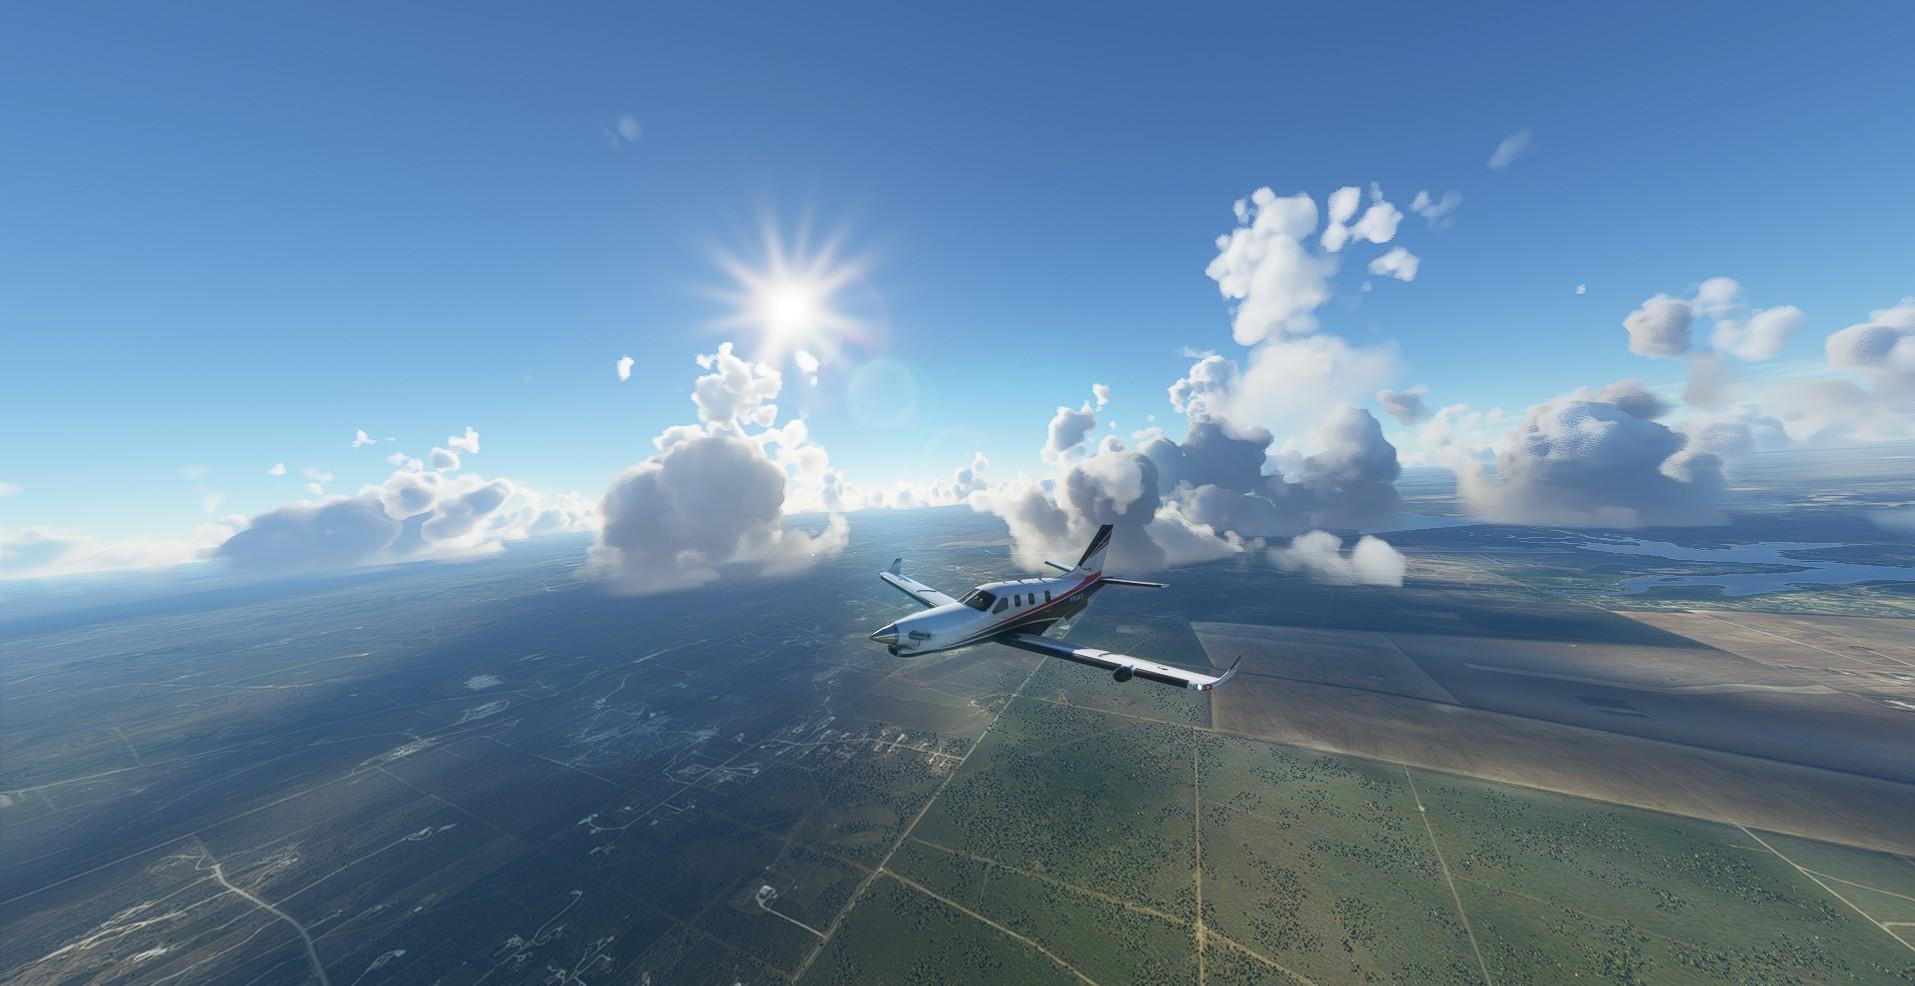 Microsoft Flight Simulator 1 9 2021 6 52 16 Pm